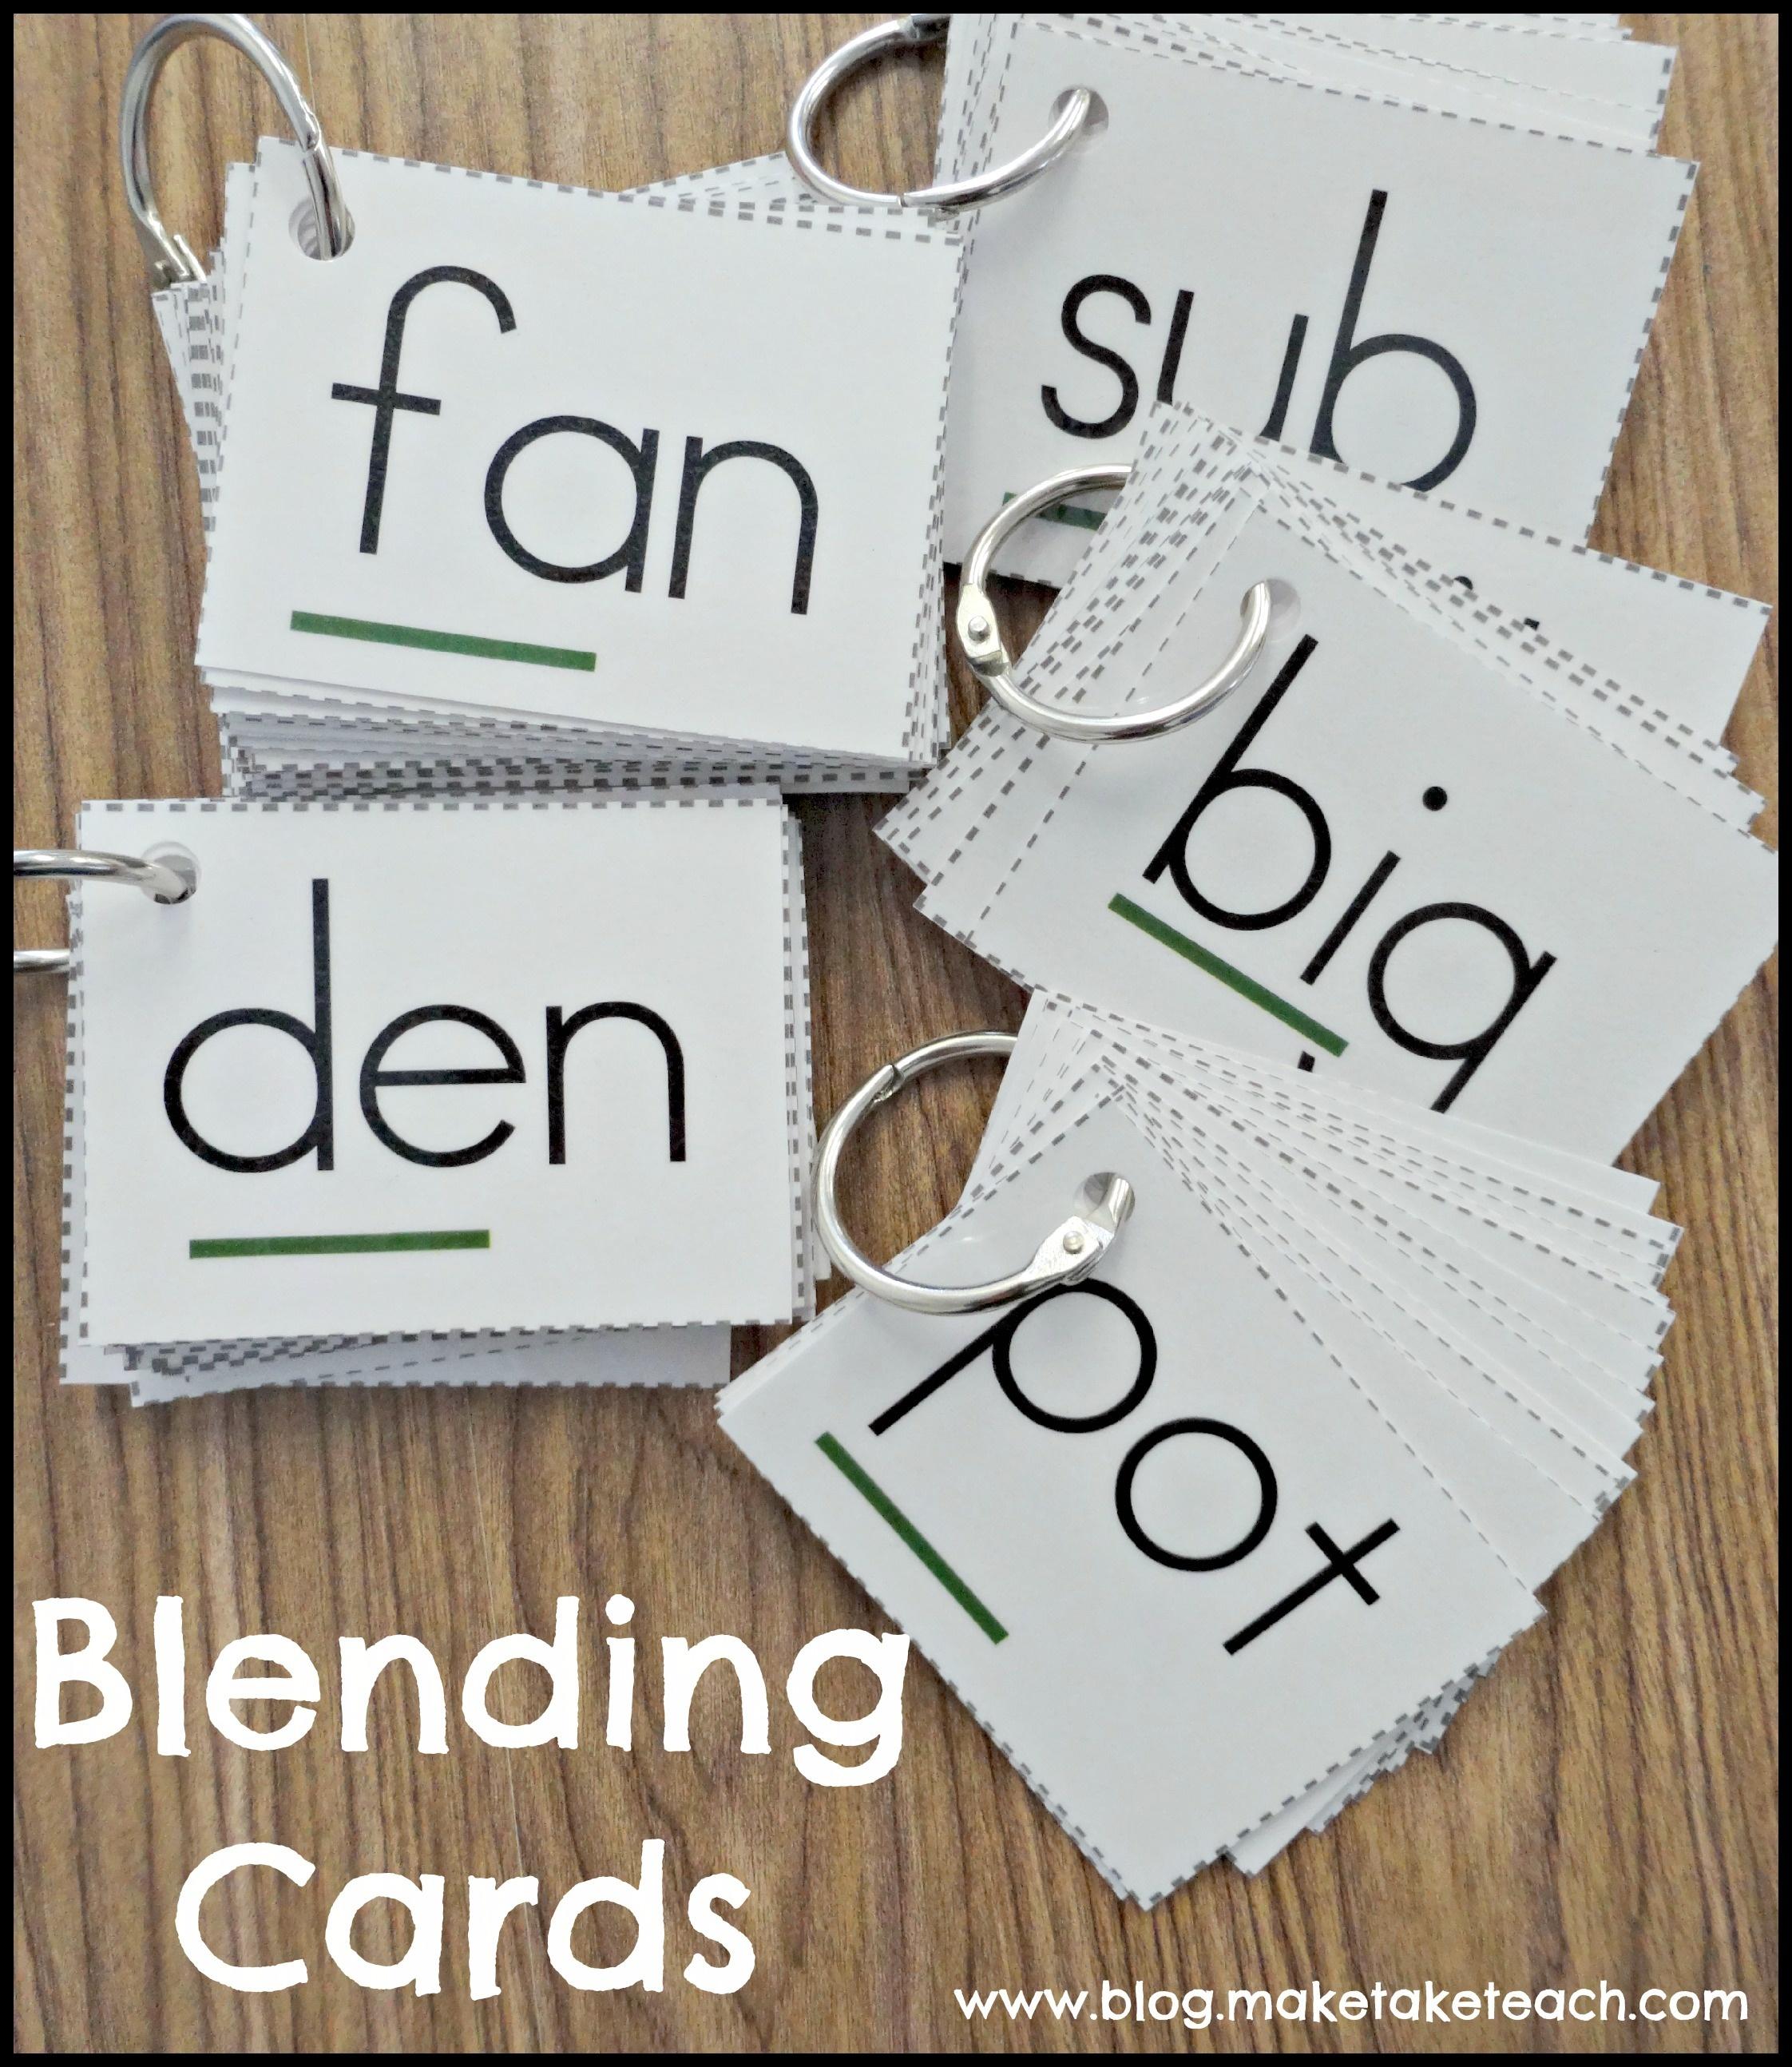 Teaching Students To Blend Words - Make Take & Teach - Free Printable Blending Cards